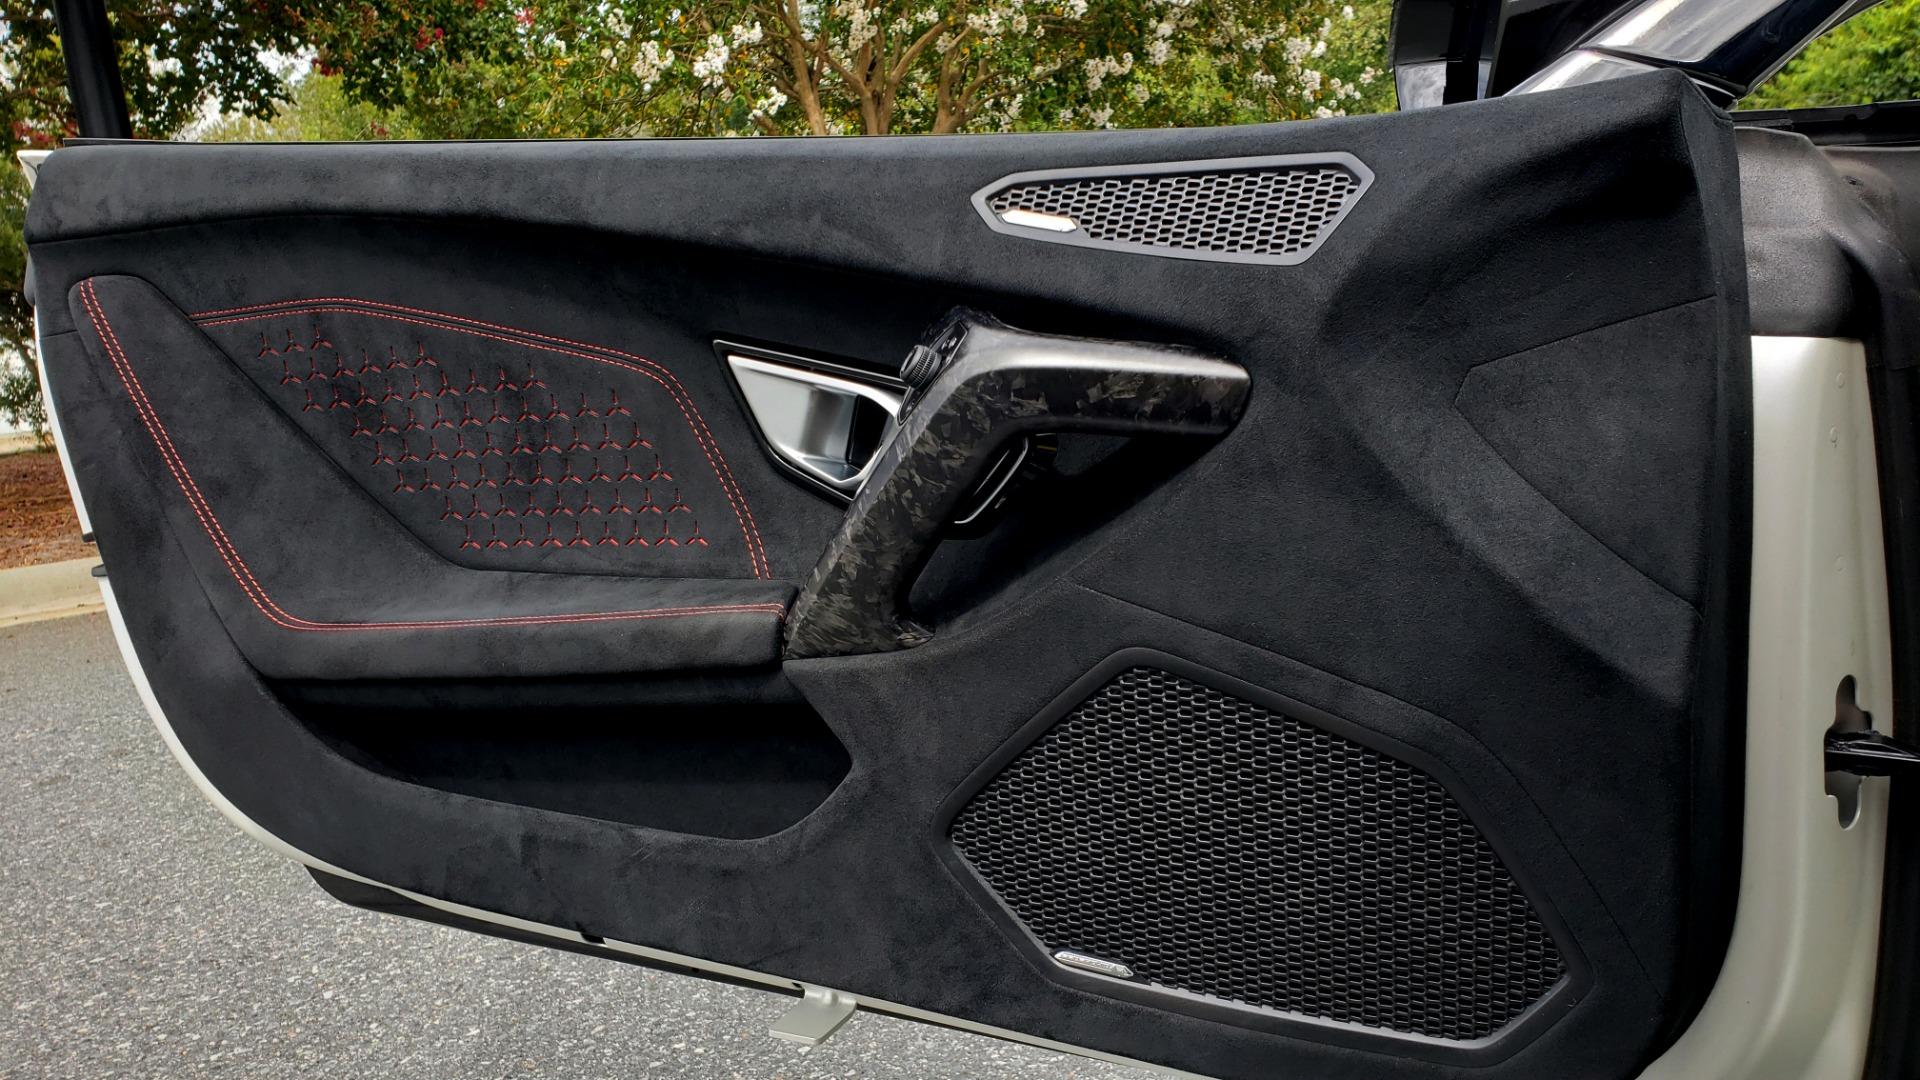 Used 2018 Lamborghini HURACAN PERFORMANTE 5.2L V10 / 630HP / 7-SPD AUTO / AWD / NAV / PREM SND for sale $269,995 at Formula Imports in Charlotte NC 28227 44